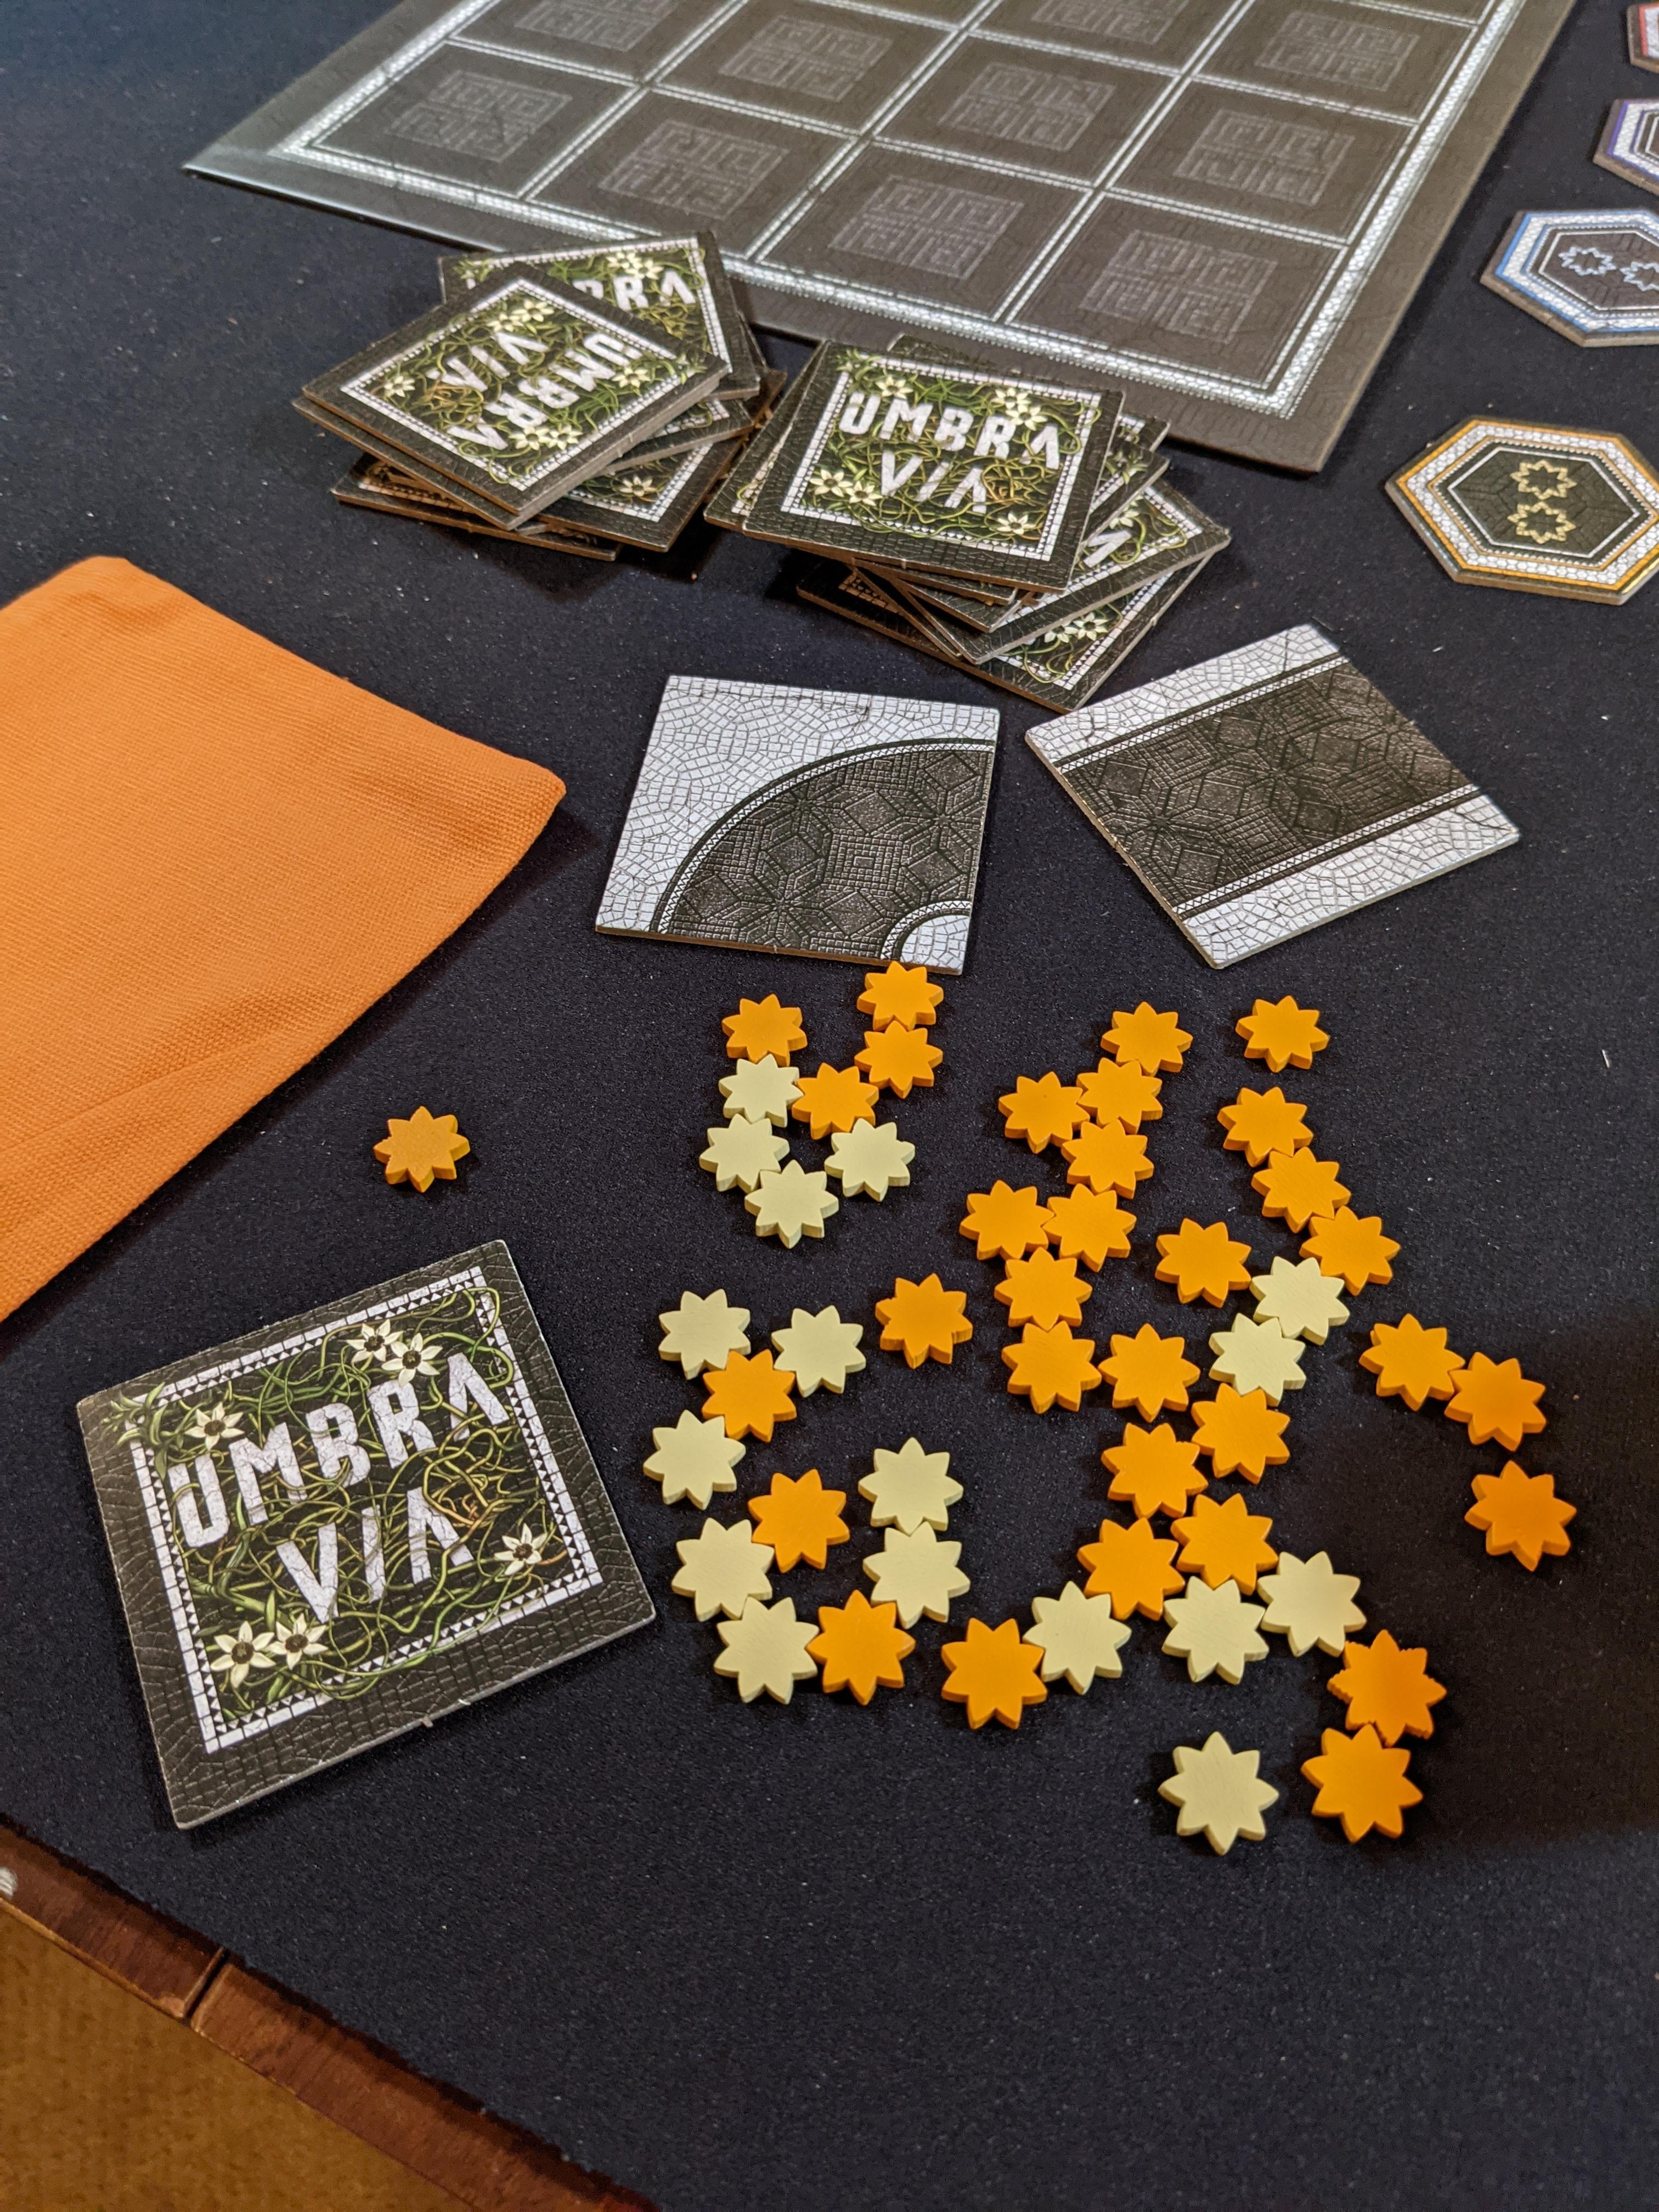 Dale Yu: Review of Umbra Via